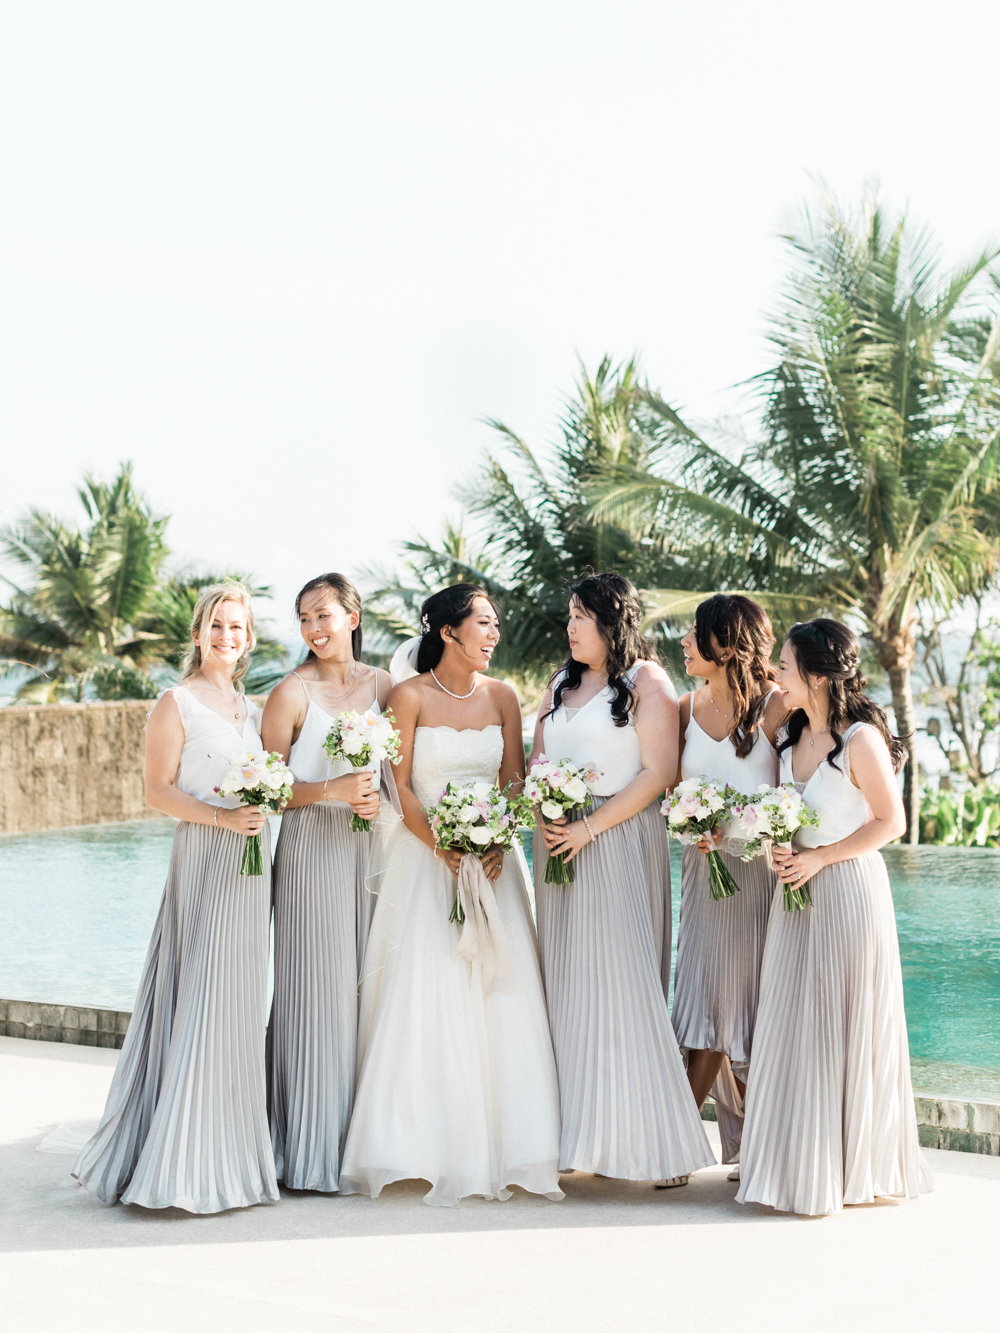 Bali_Real_Wedding_(c)_Rory_Wylie-79.jpg